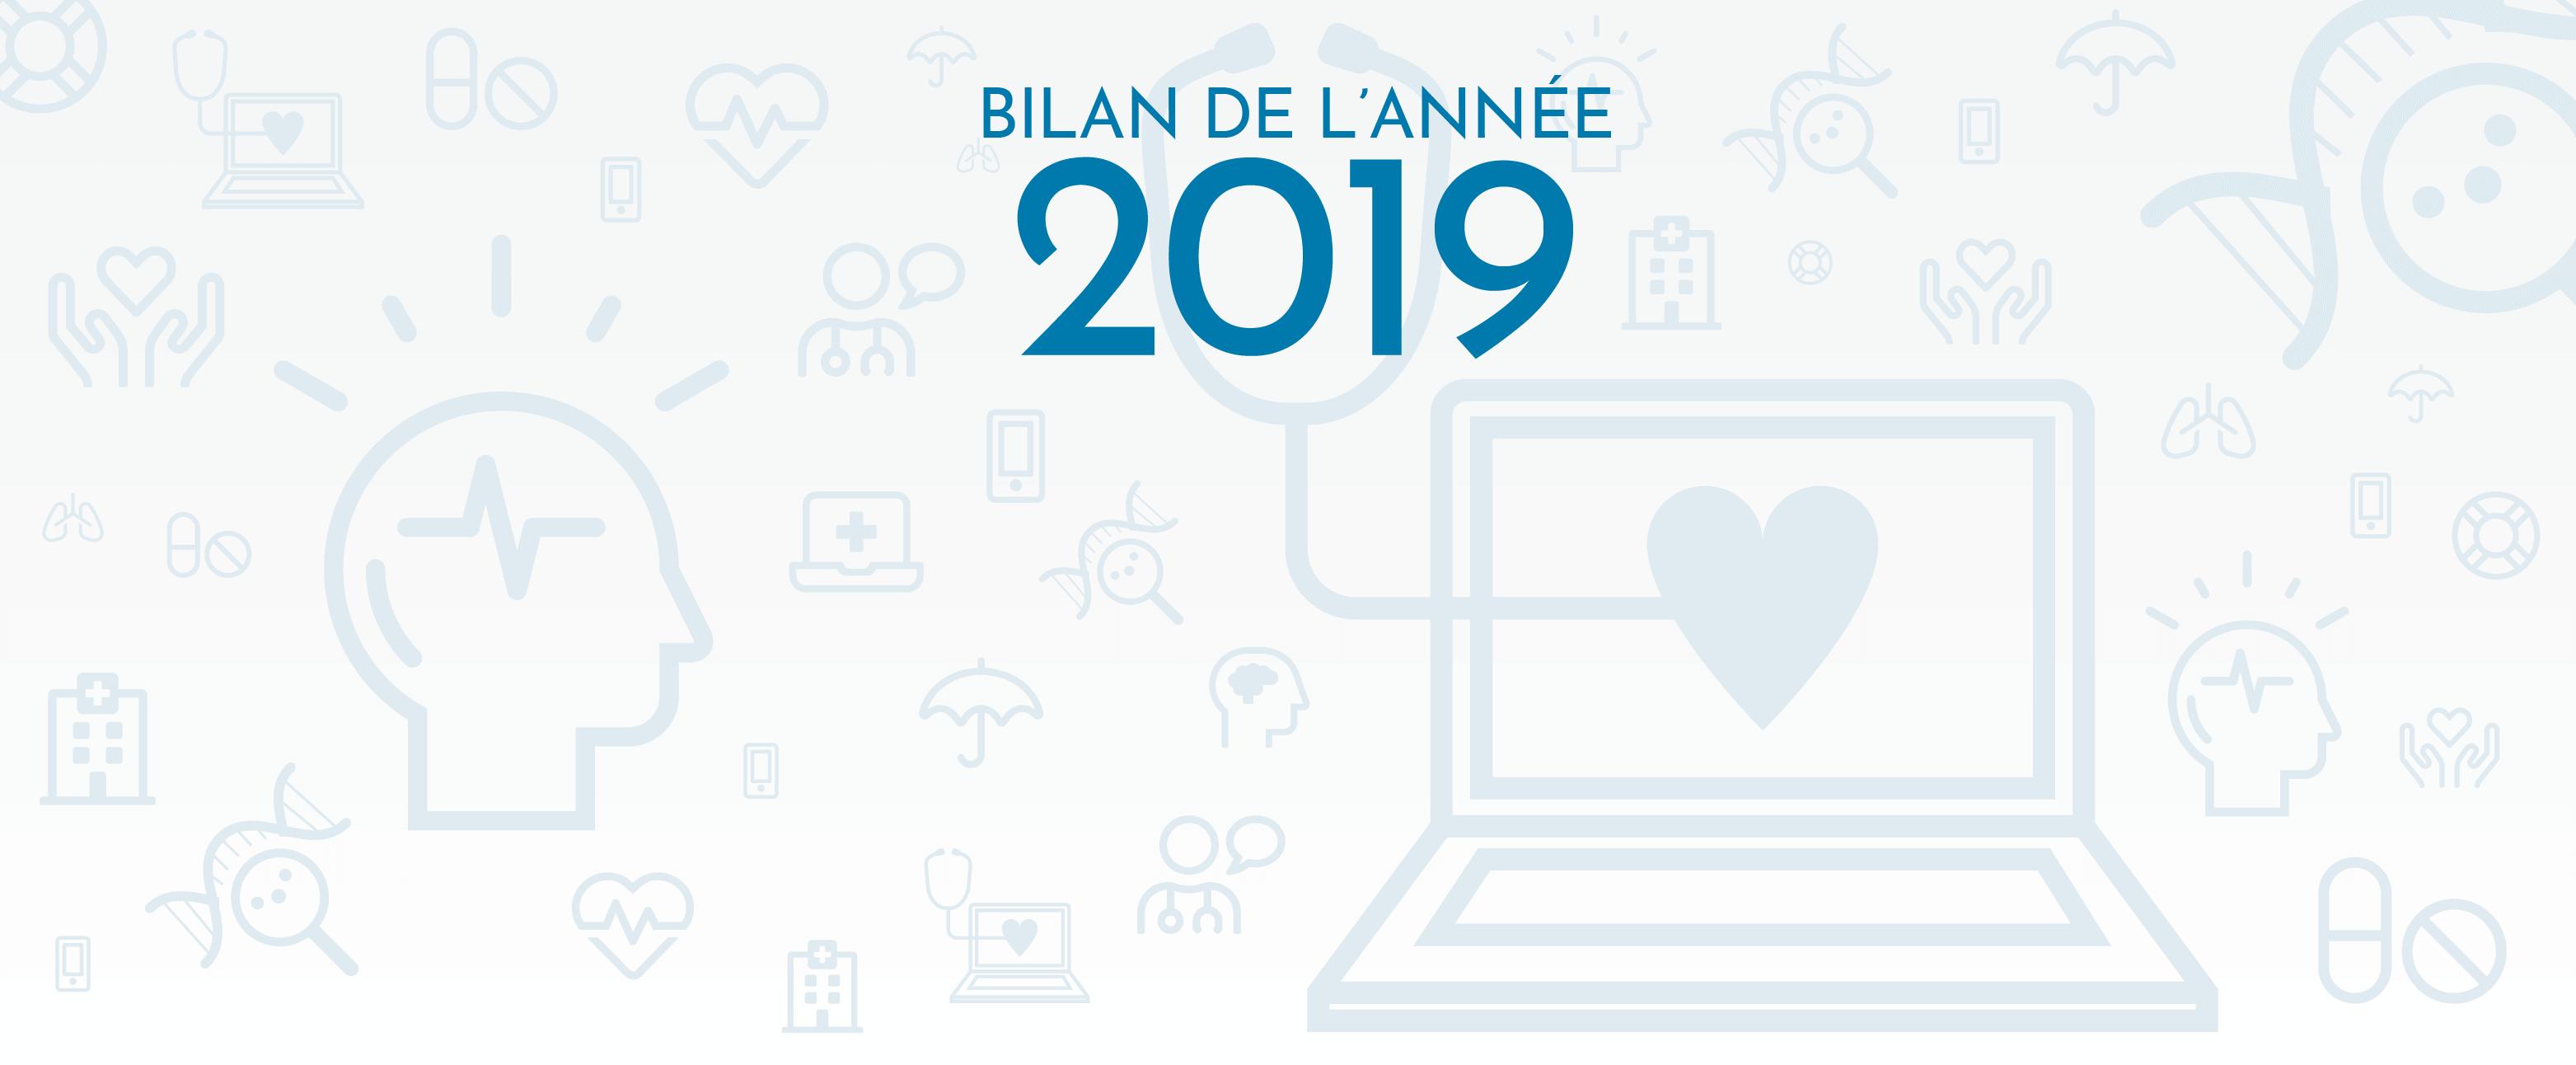 Bilan De Lannee 2019